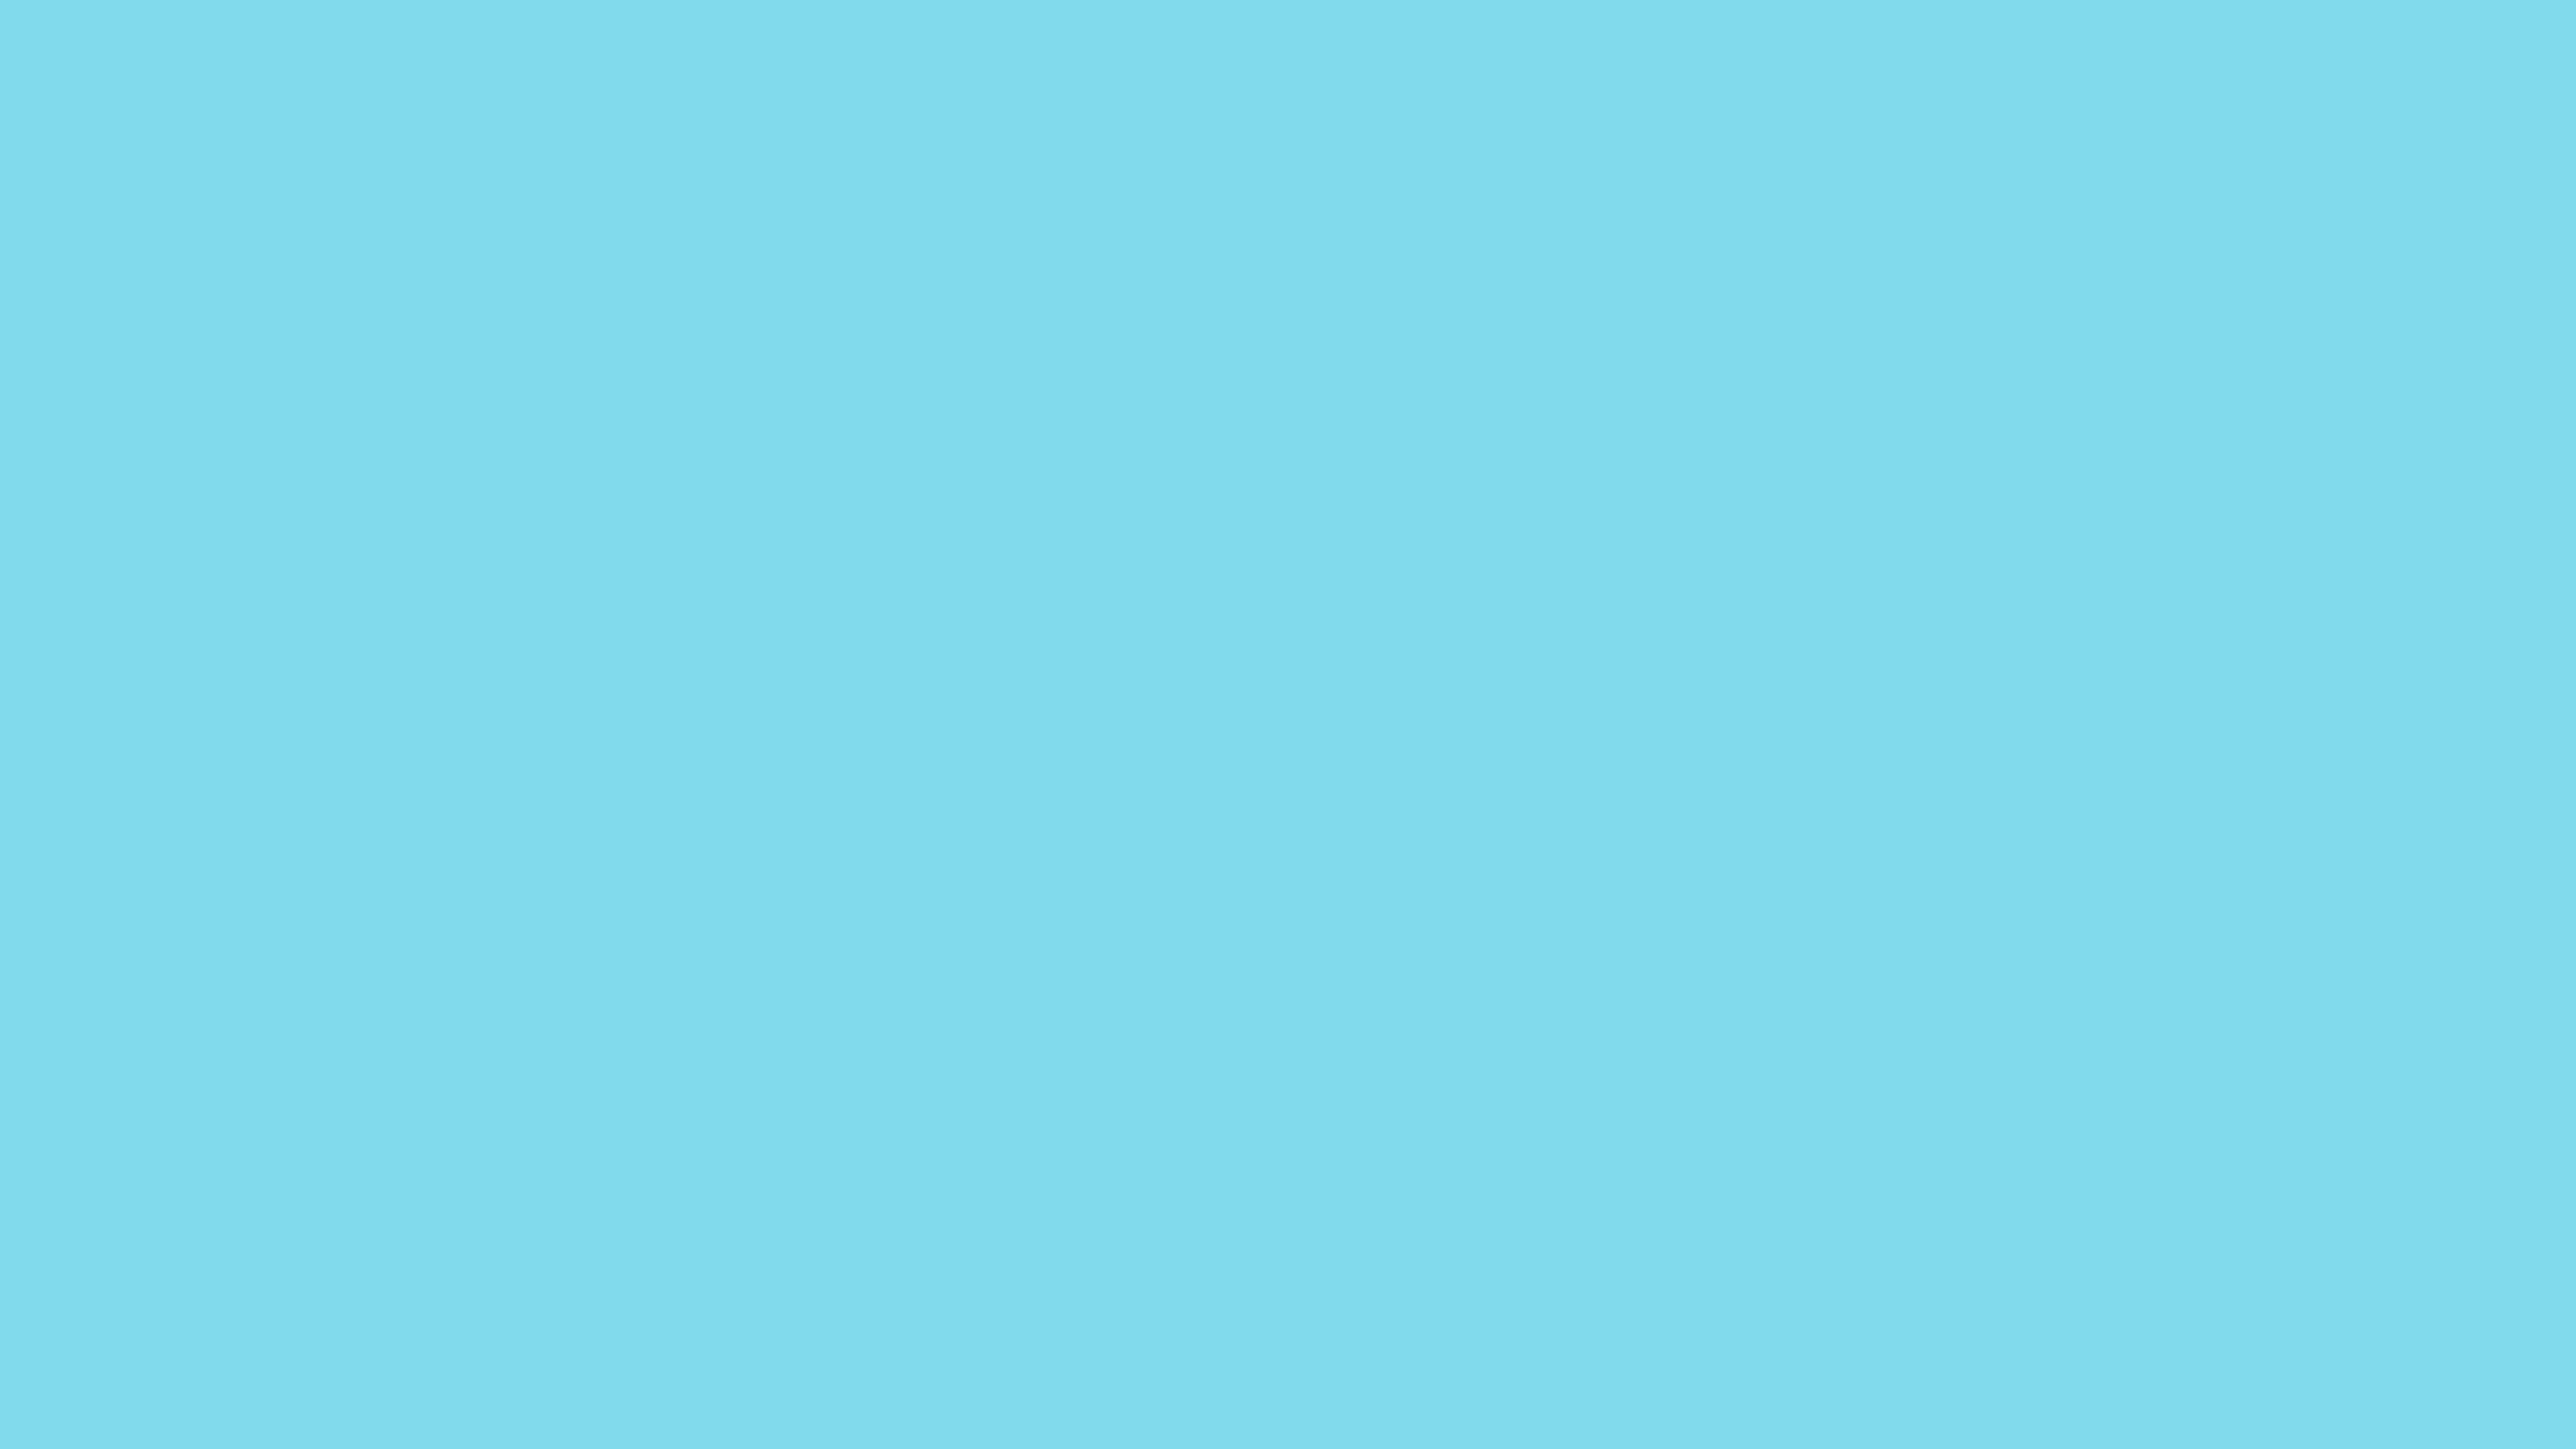 4096x2304 Medium Sky Blue Solid Color Background